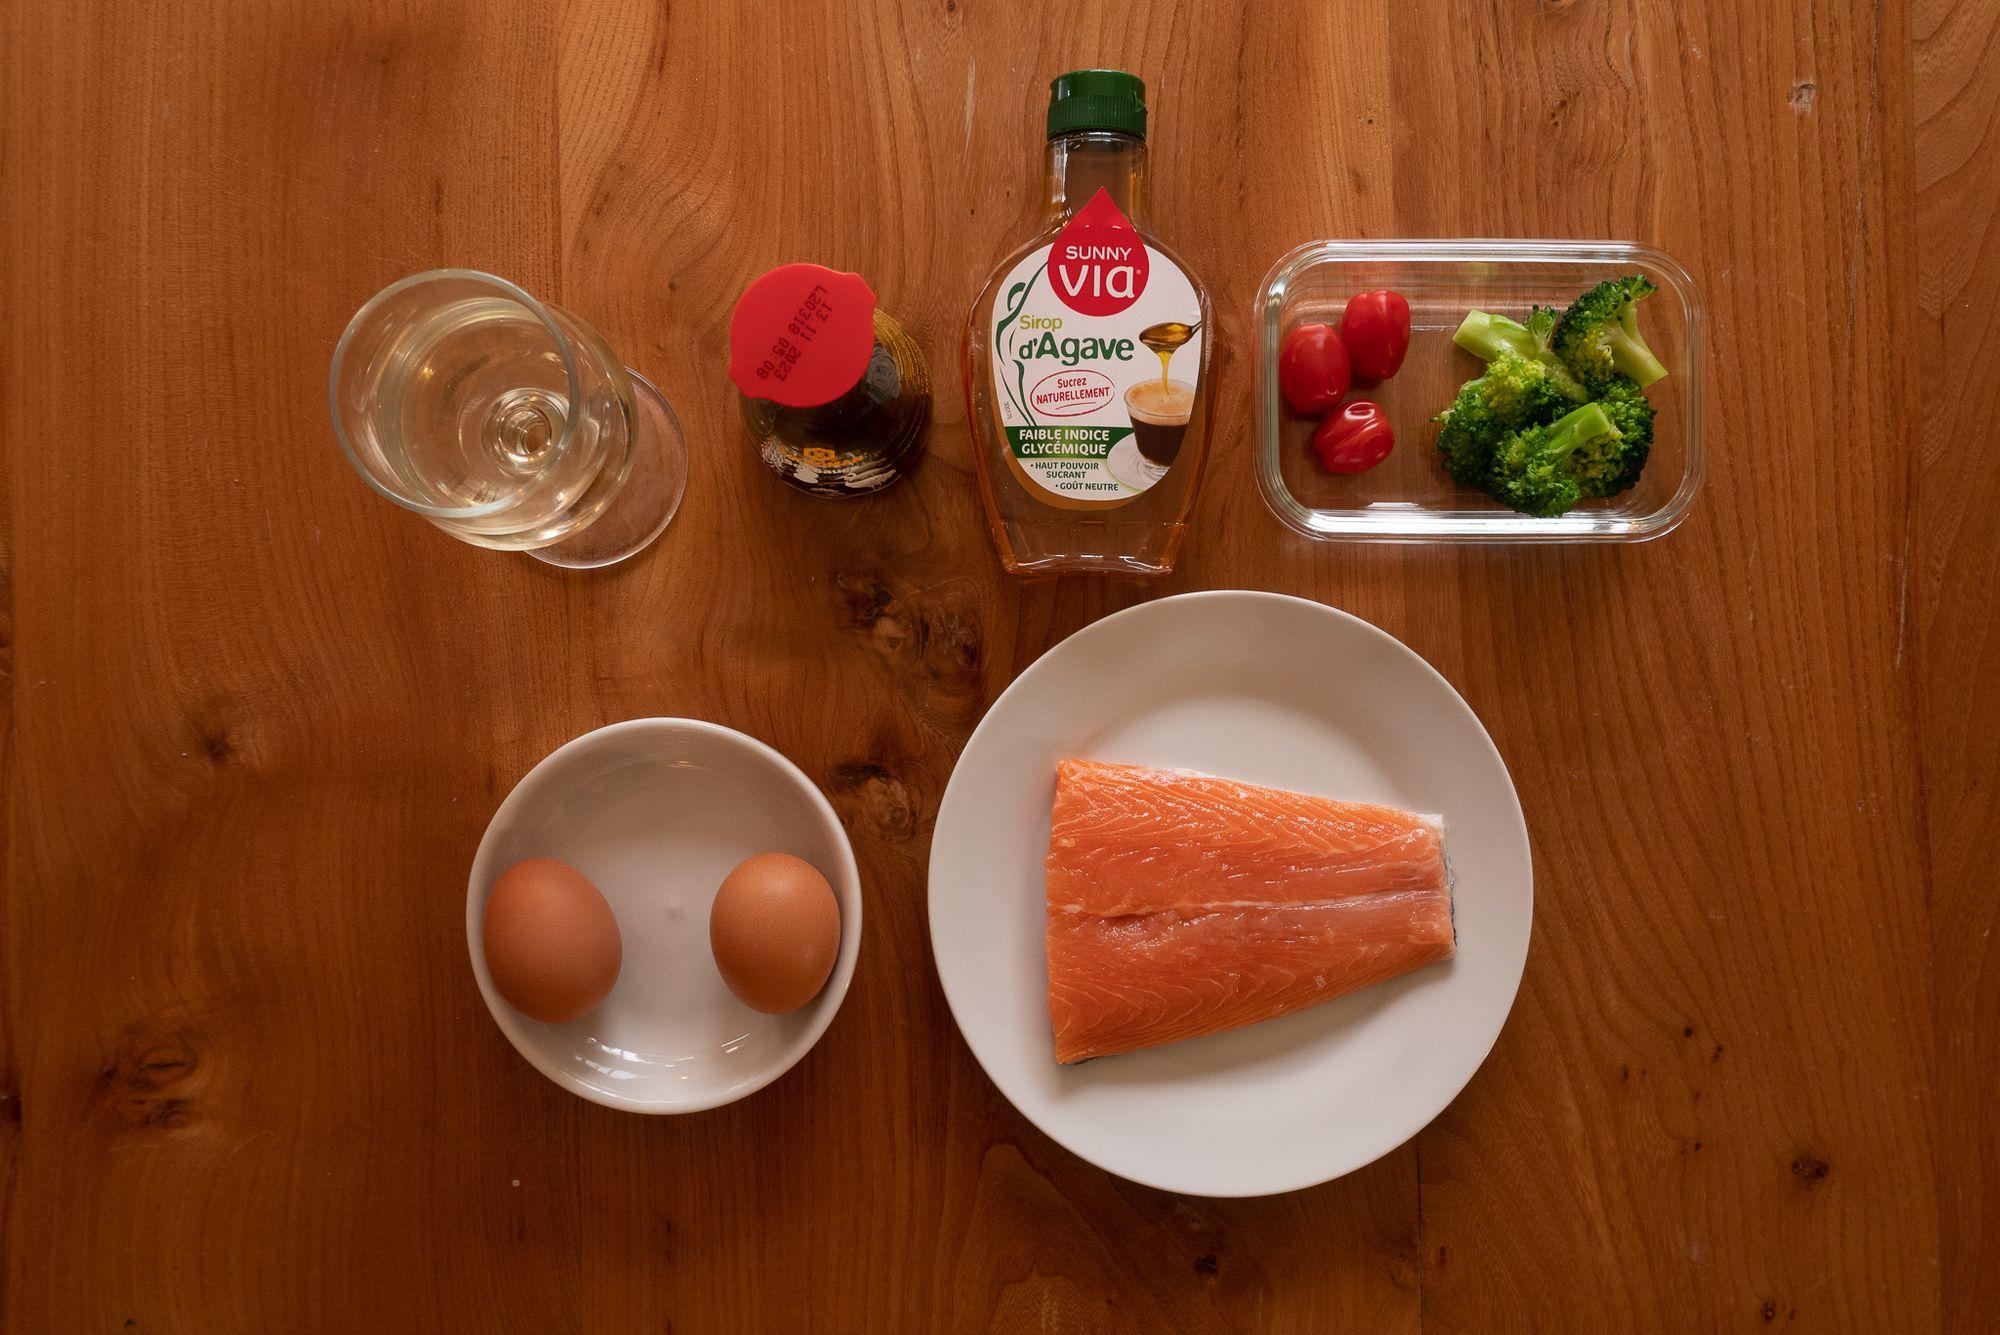 Today's salmon teriyaki and tamagoyaki bento ingredients